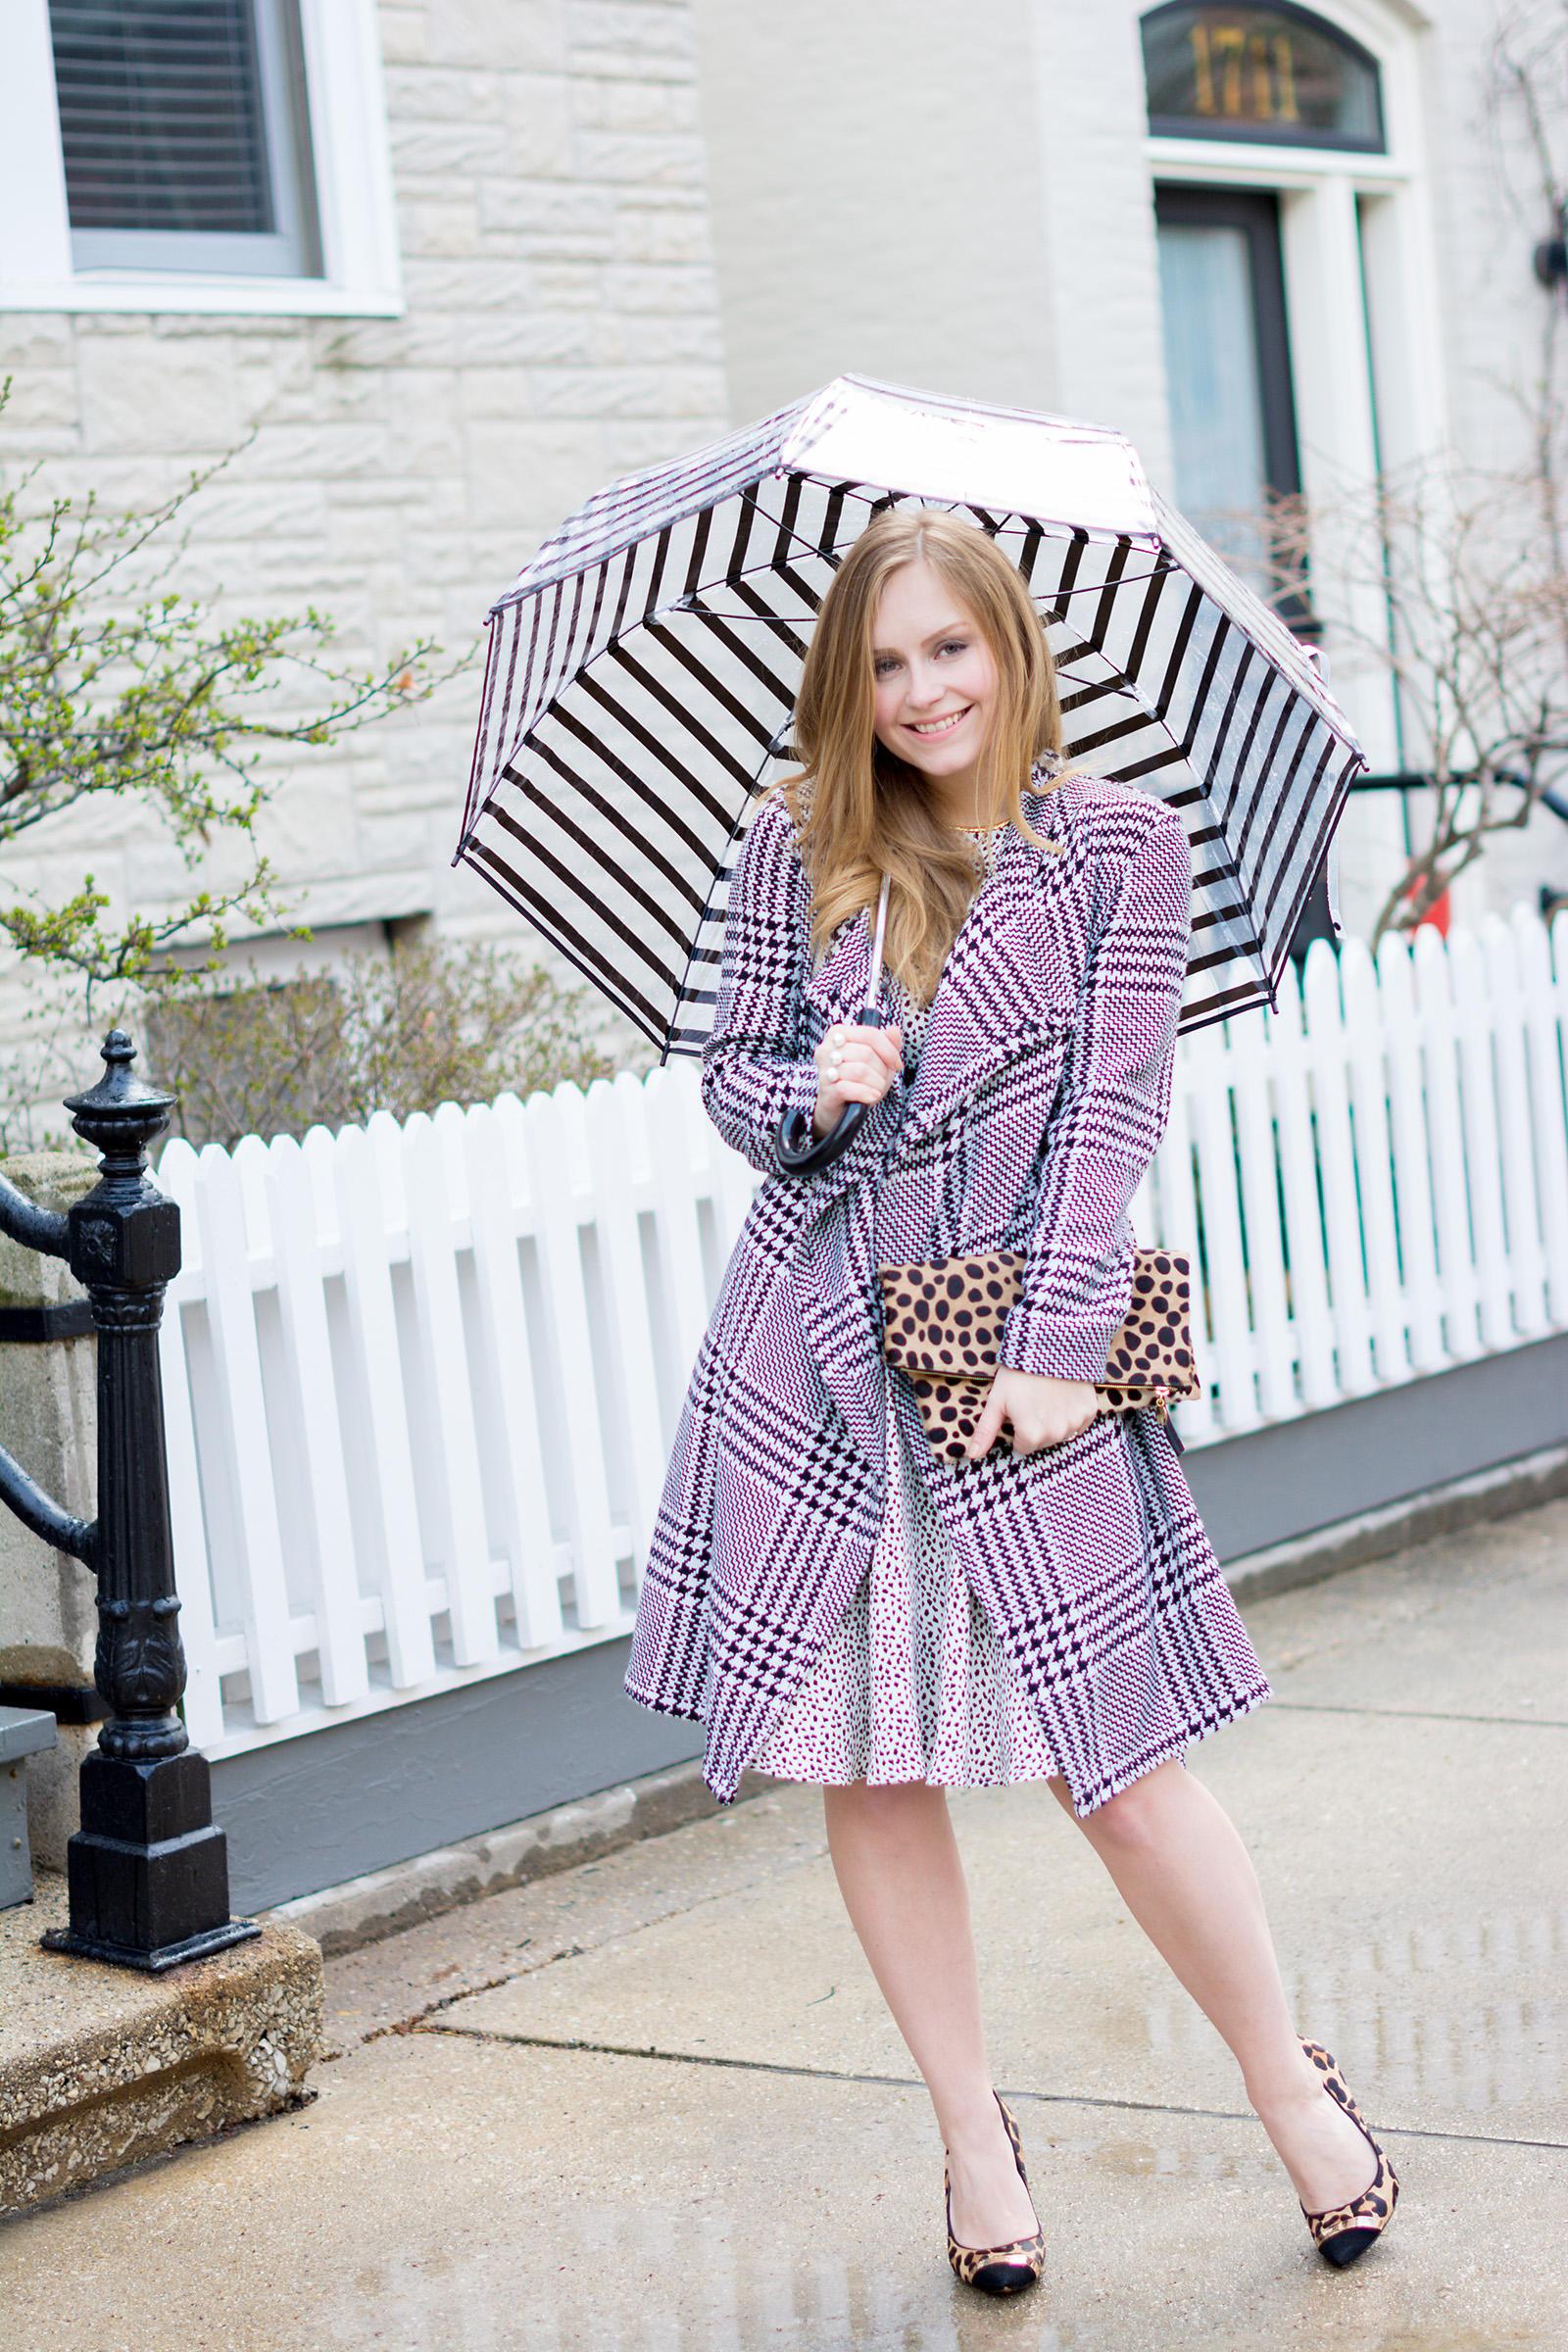 April Showers Outfit Stripes-43160